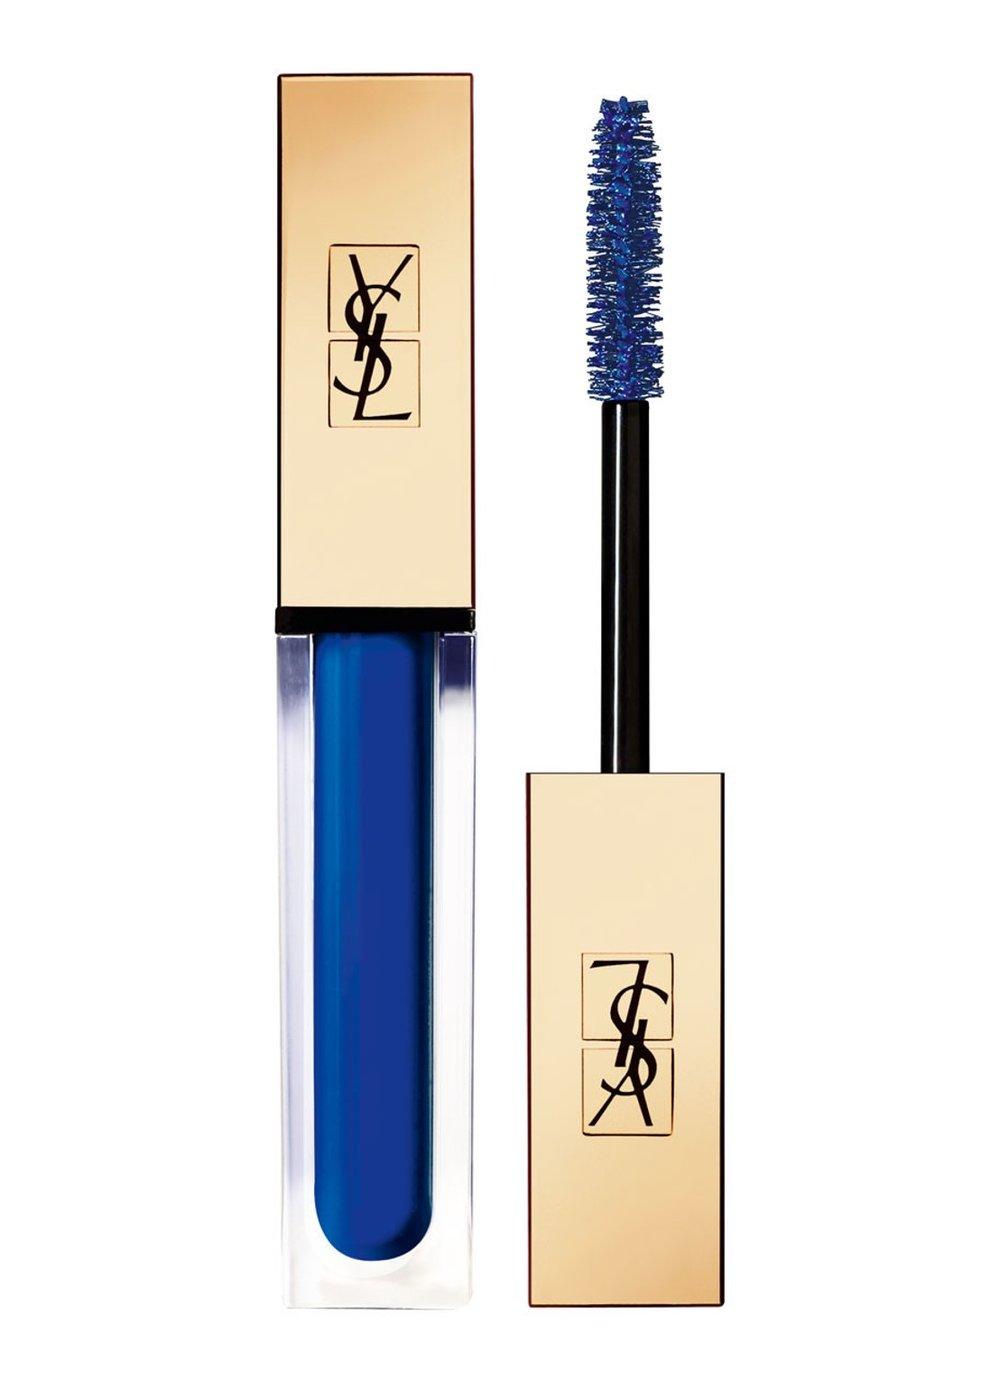 Yves Saint Laurent - Mascara Vinyl Couture - I'm The Trouble